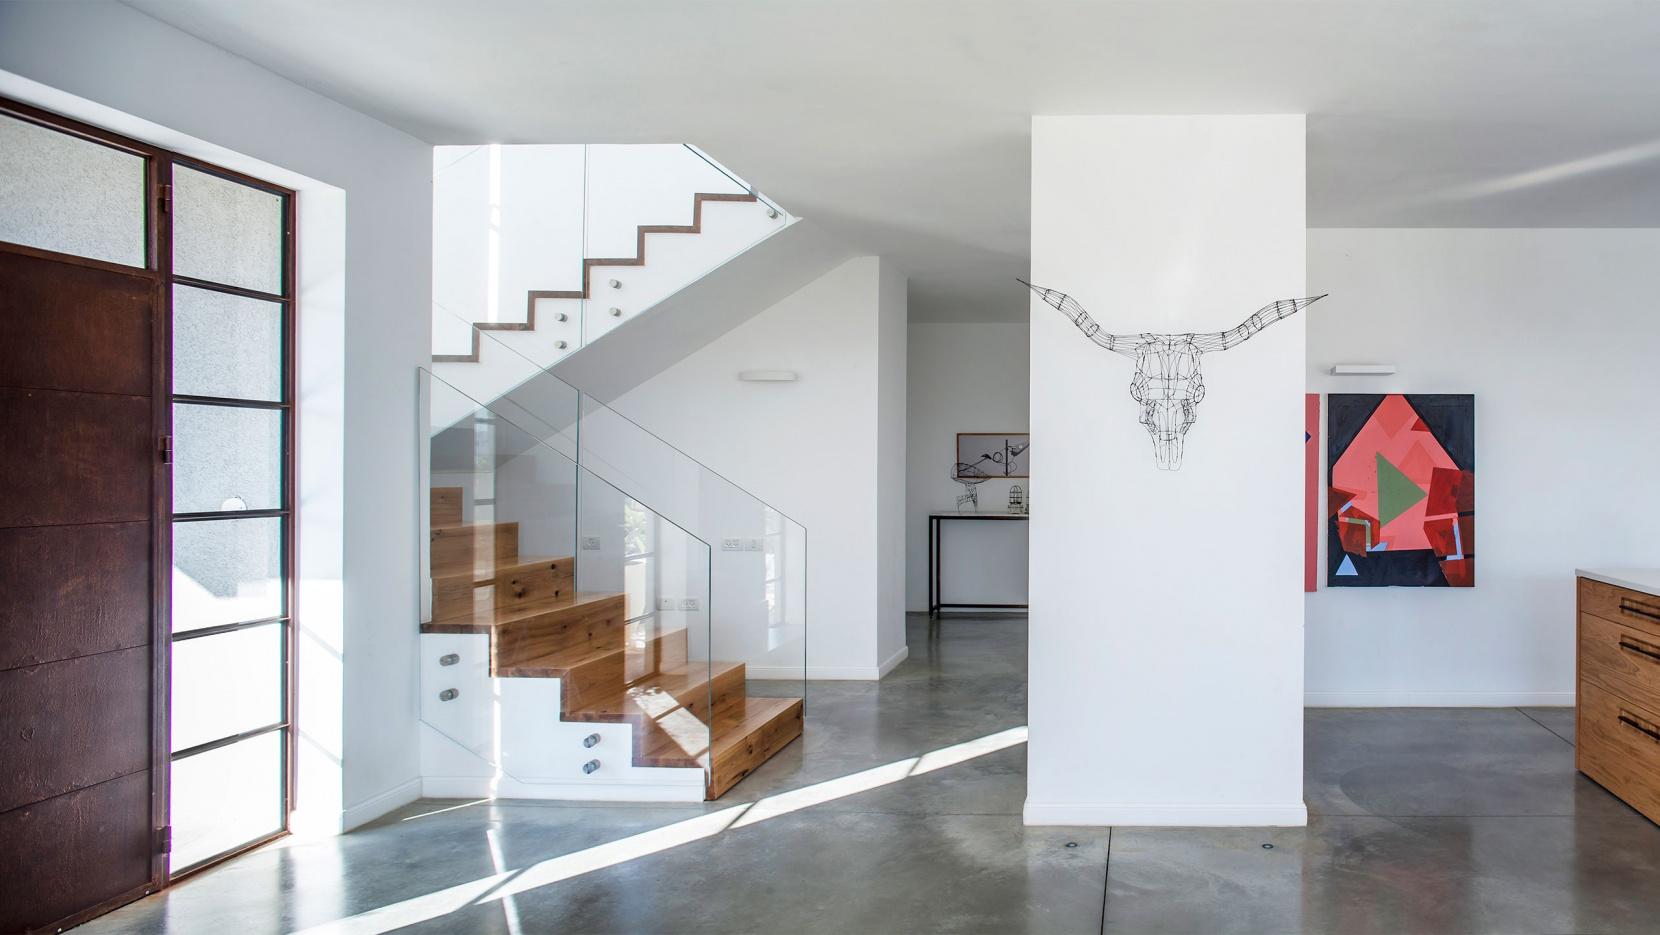 A new kibbutz house in israel by henkin shavit studio yatzer